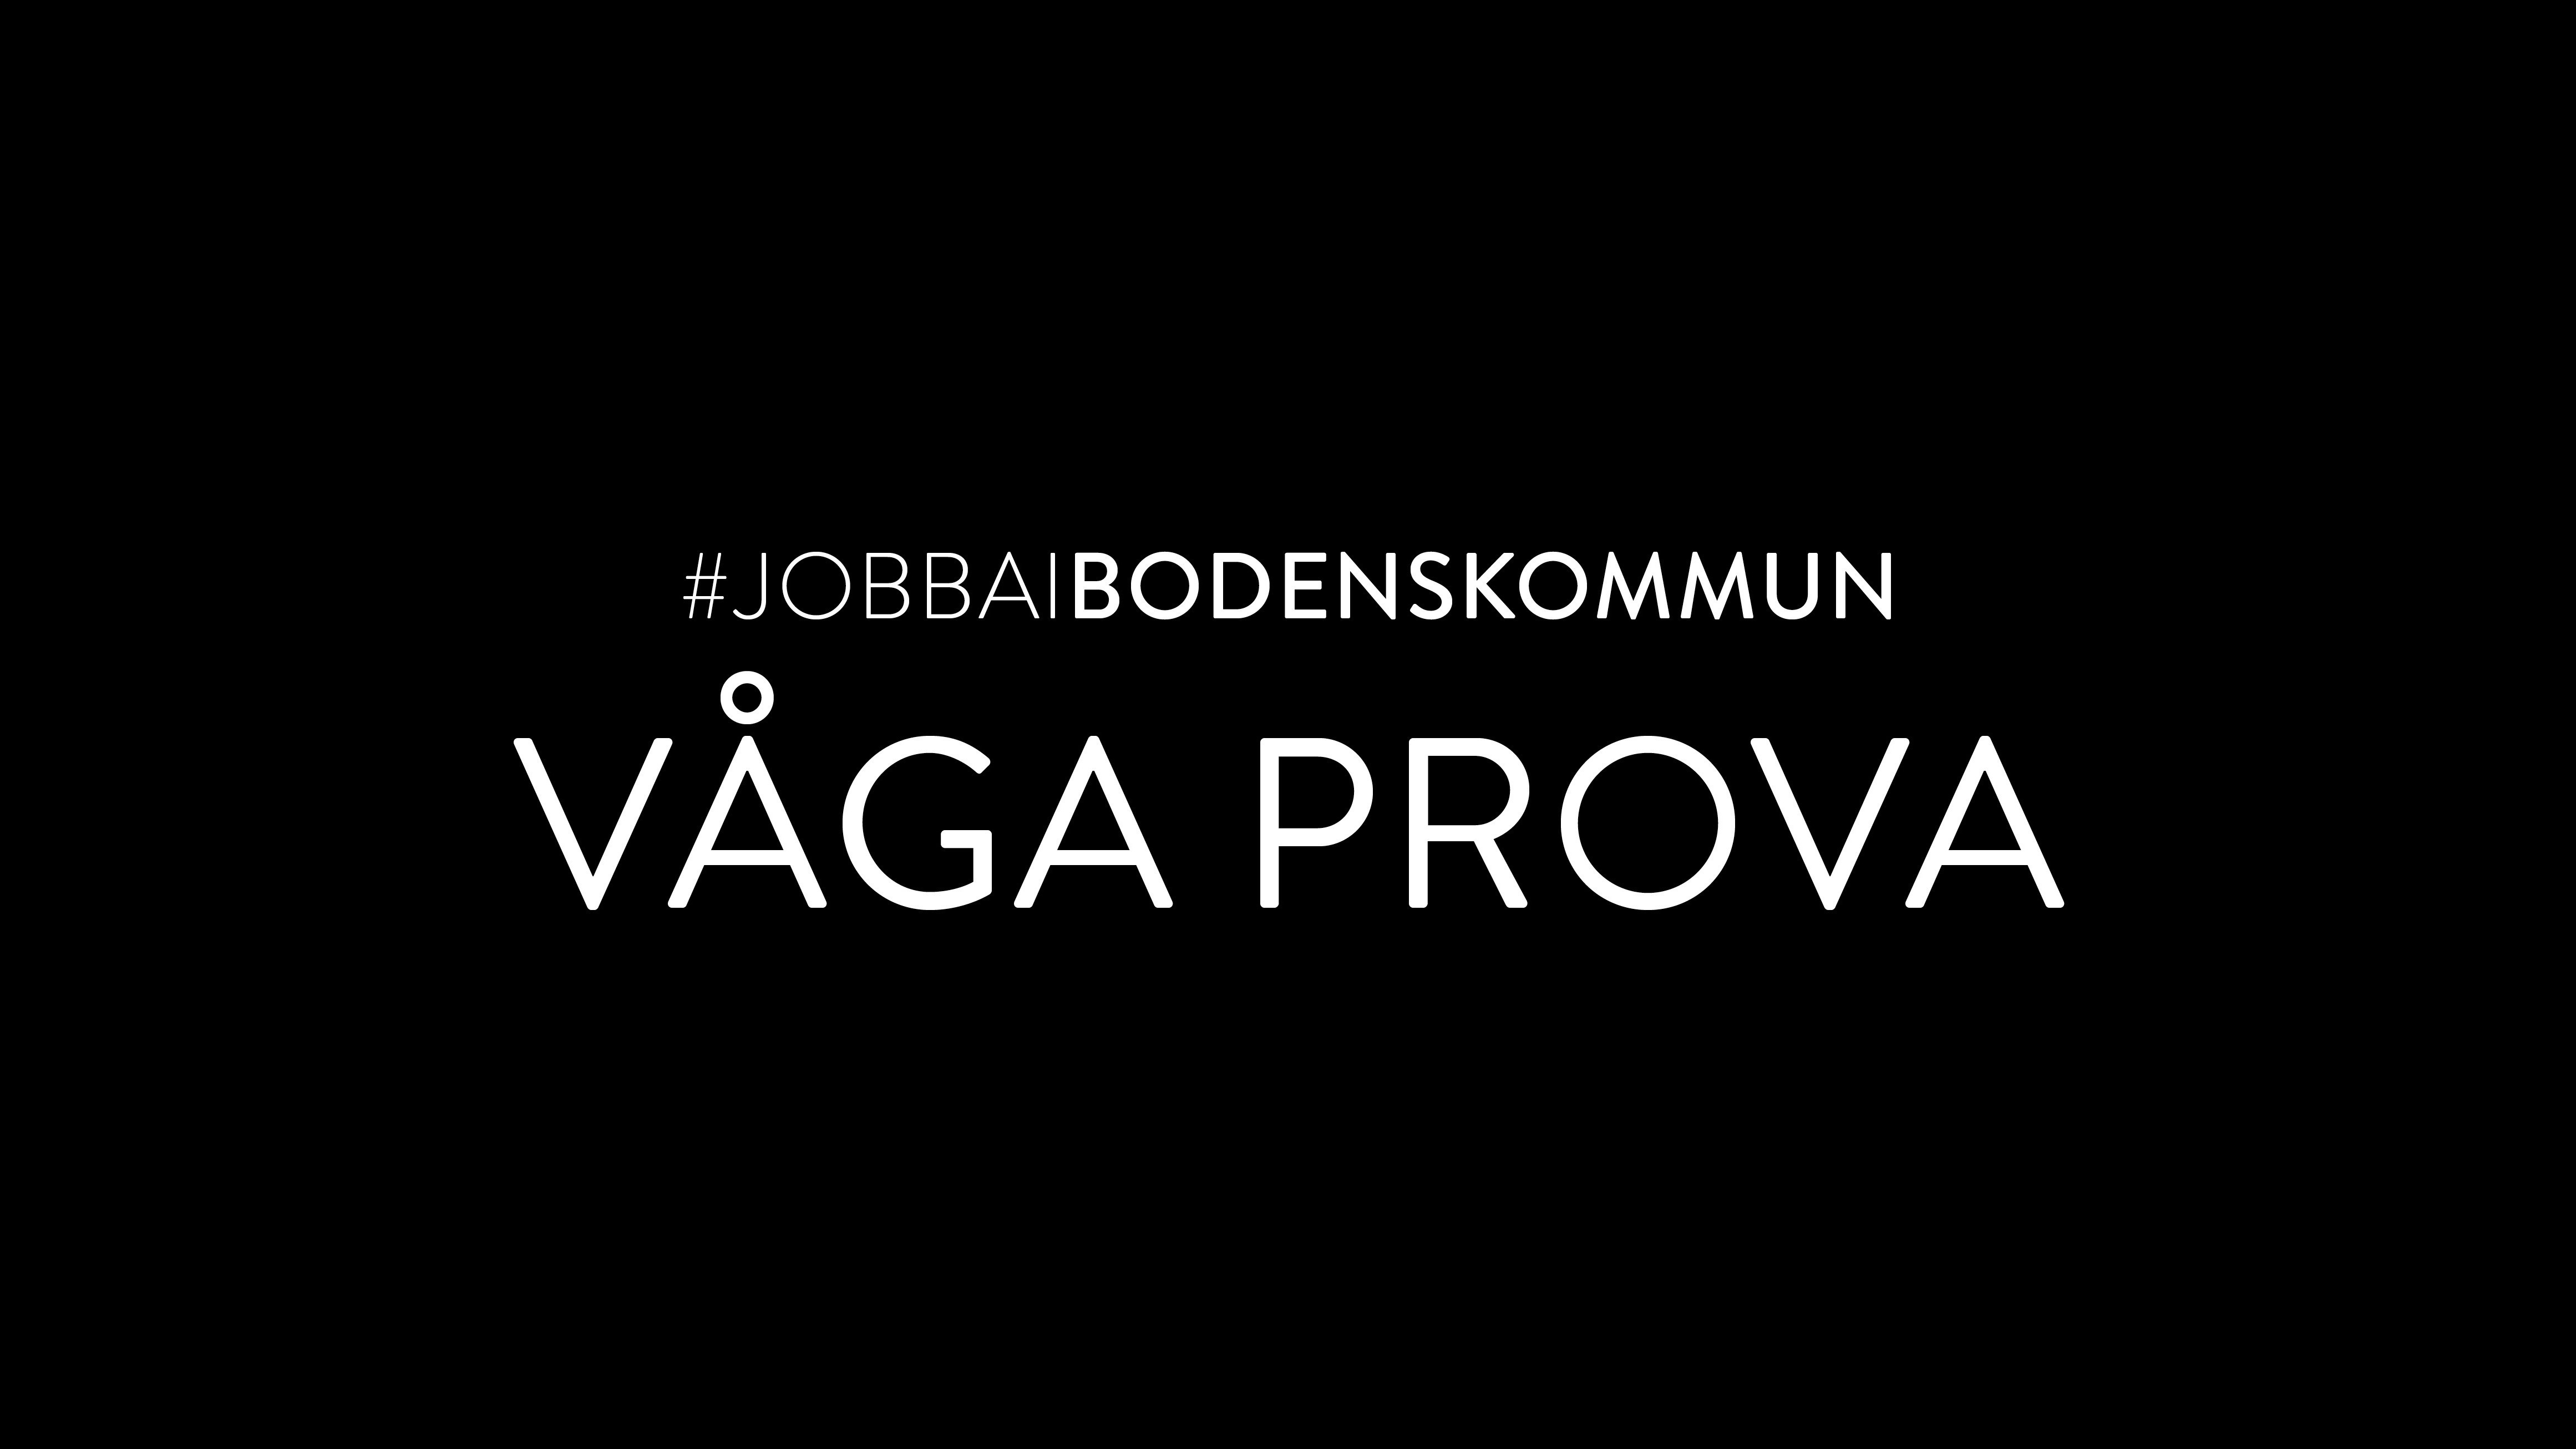 Svart bakgrund och vit text: #jobbaibodenskommun. Våga prova.